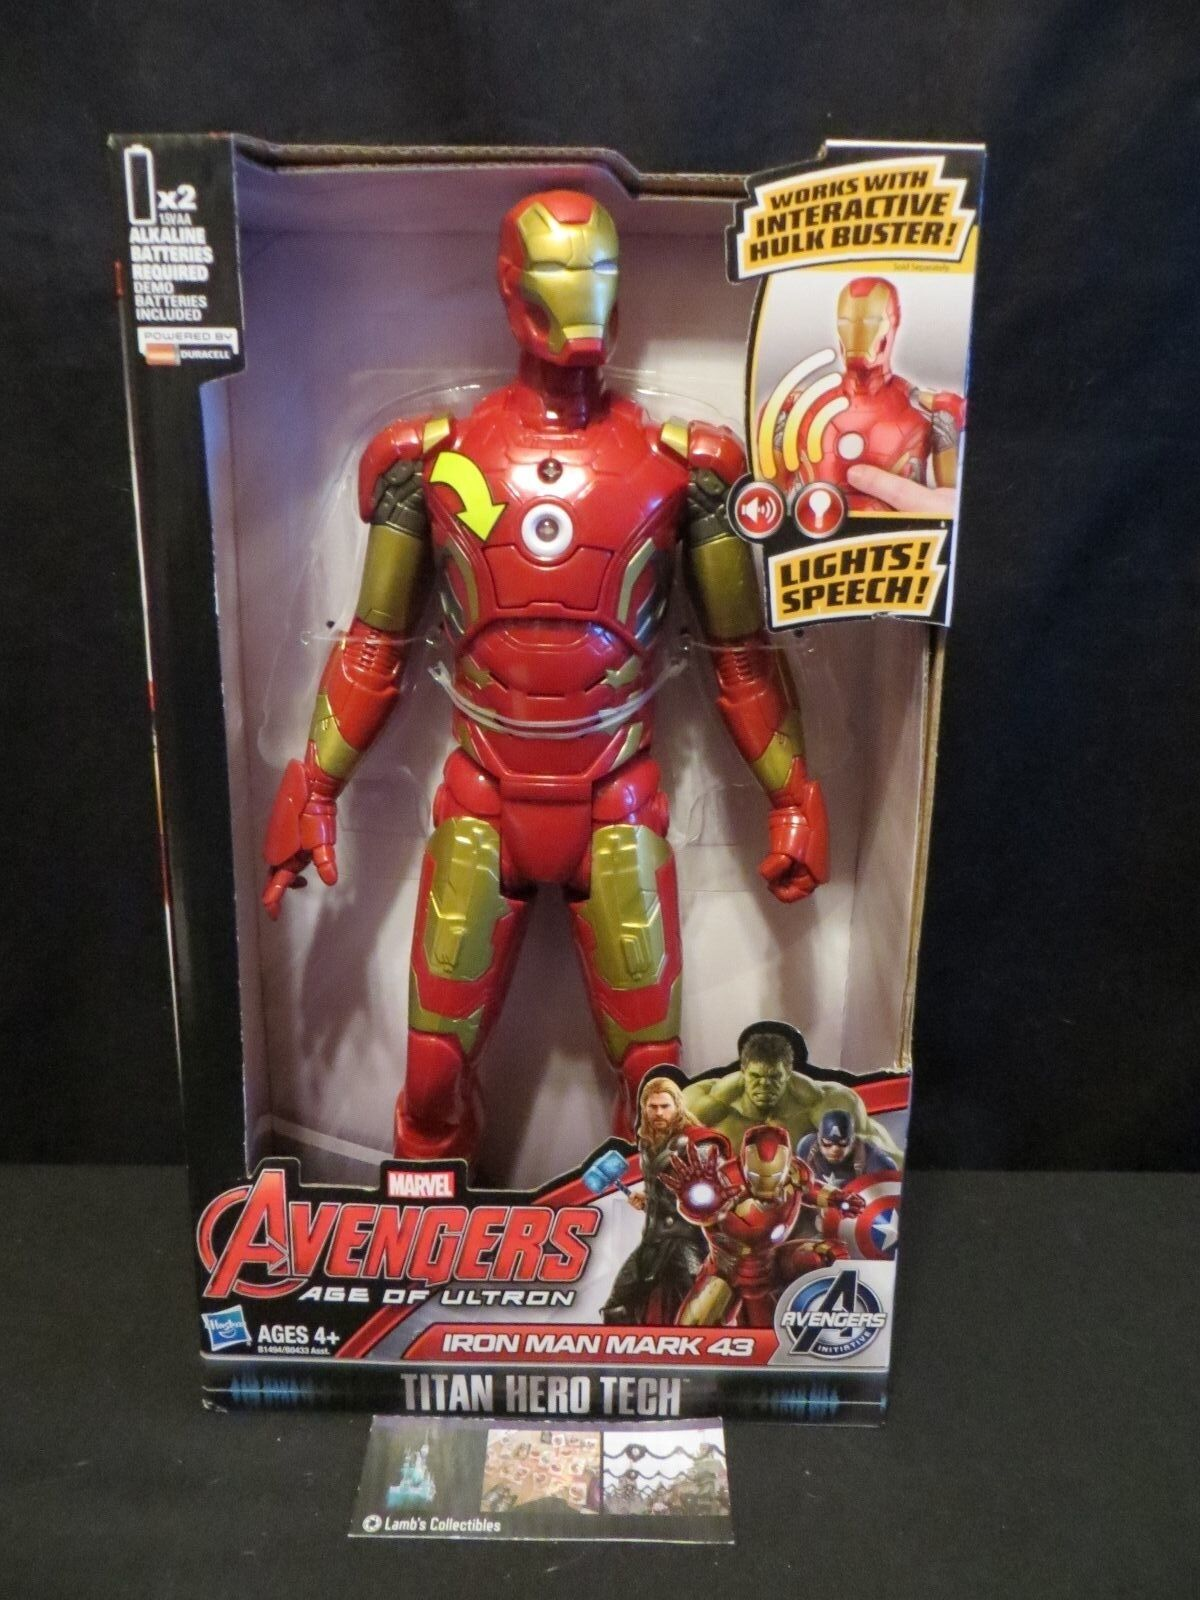 Iron Man Age of Ultron Avengers Titan Hero Tech Hasbro Action Figure